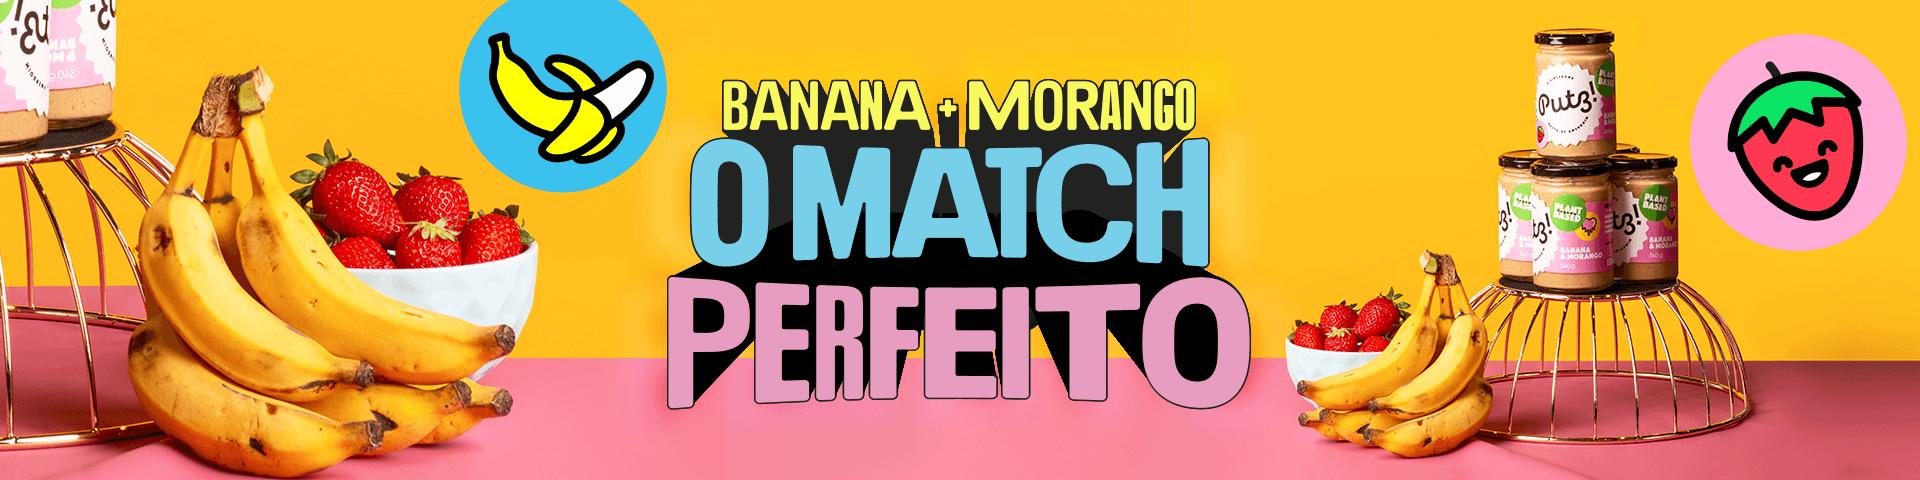 Putz! Morango & Banana